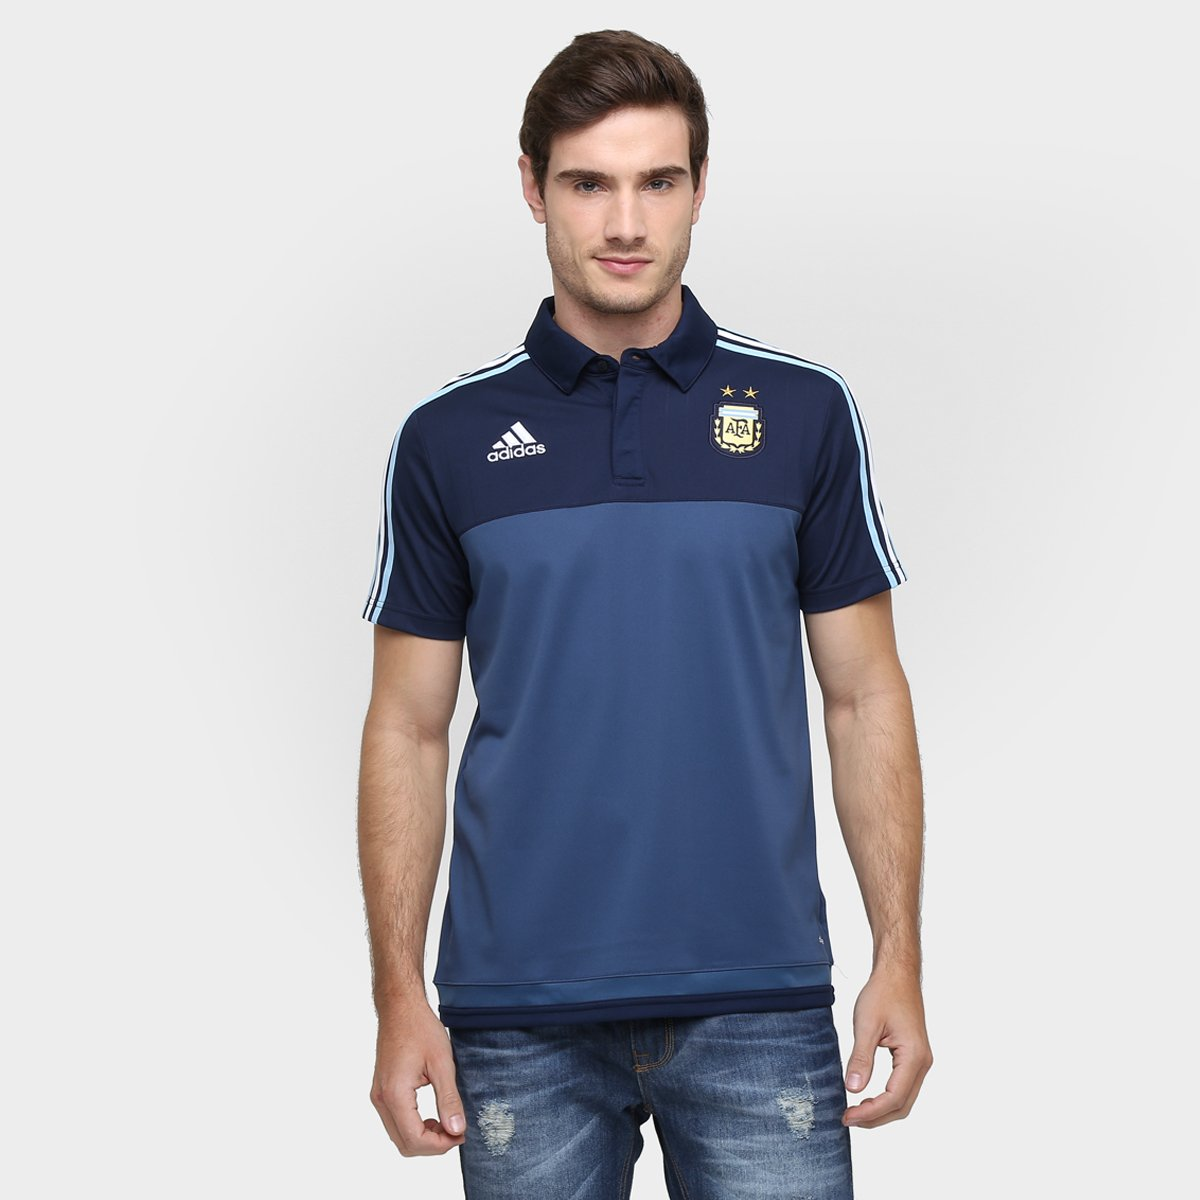 6ac4cf83a40b6 Camisa Polo Adidas Argentina - Compre Agora